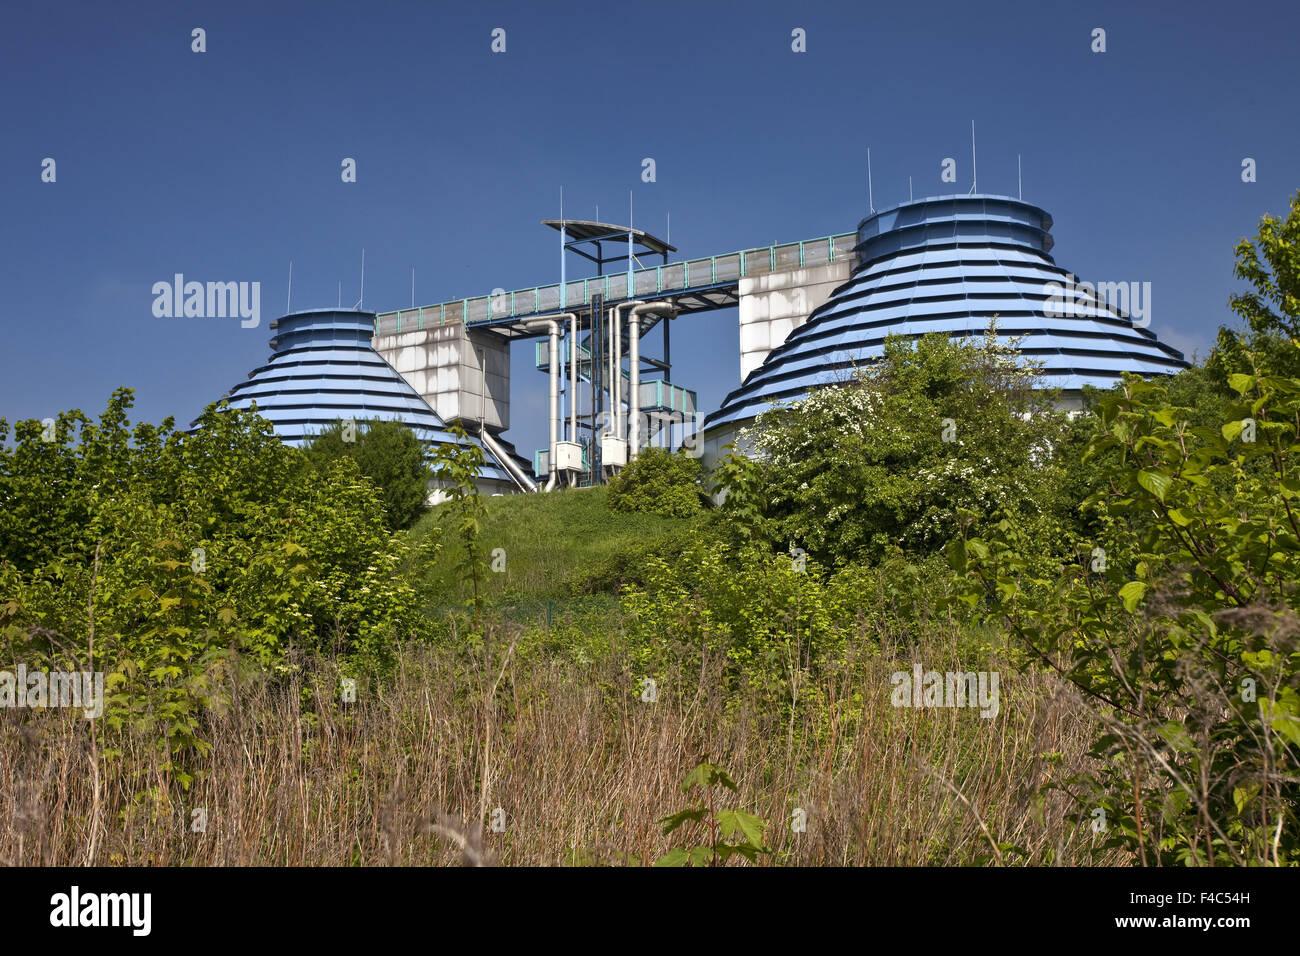 Treatment plant, Kamen, Germany - Stock Image